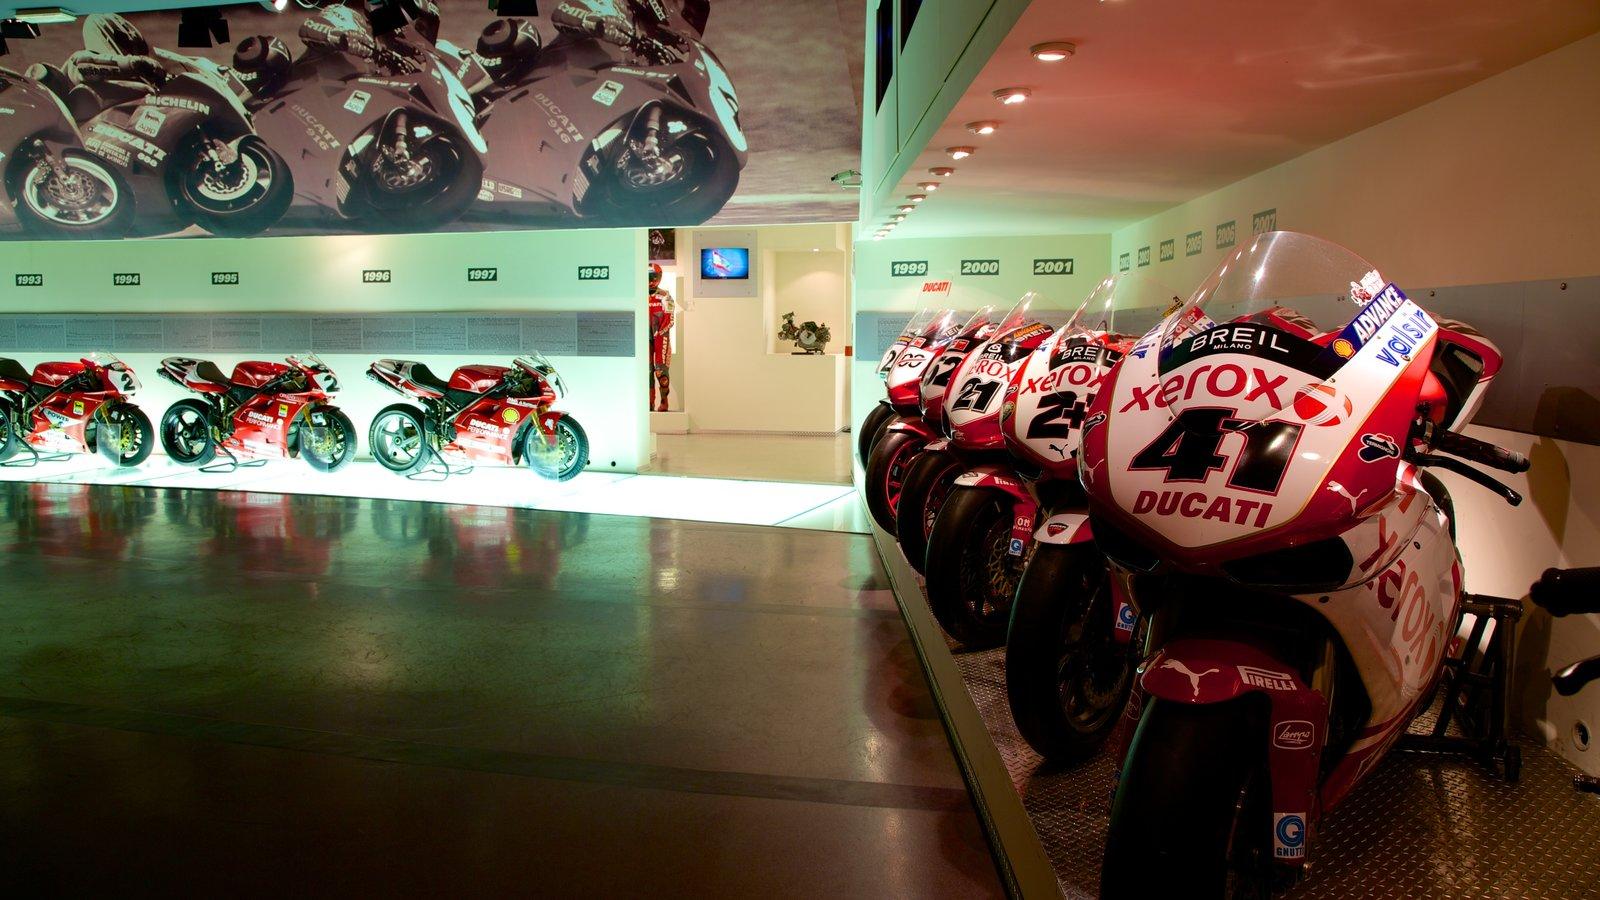 Ducati Museum showing interior views